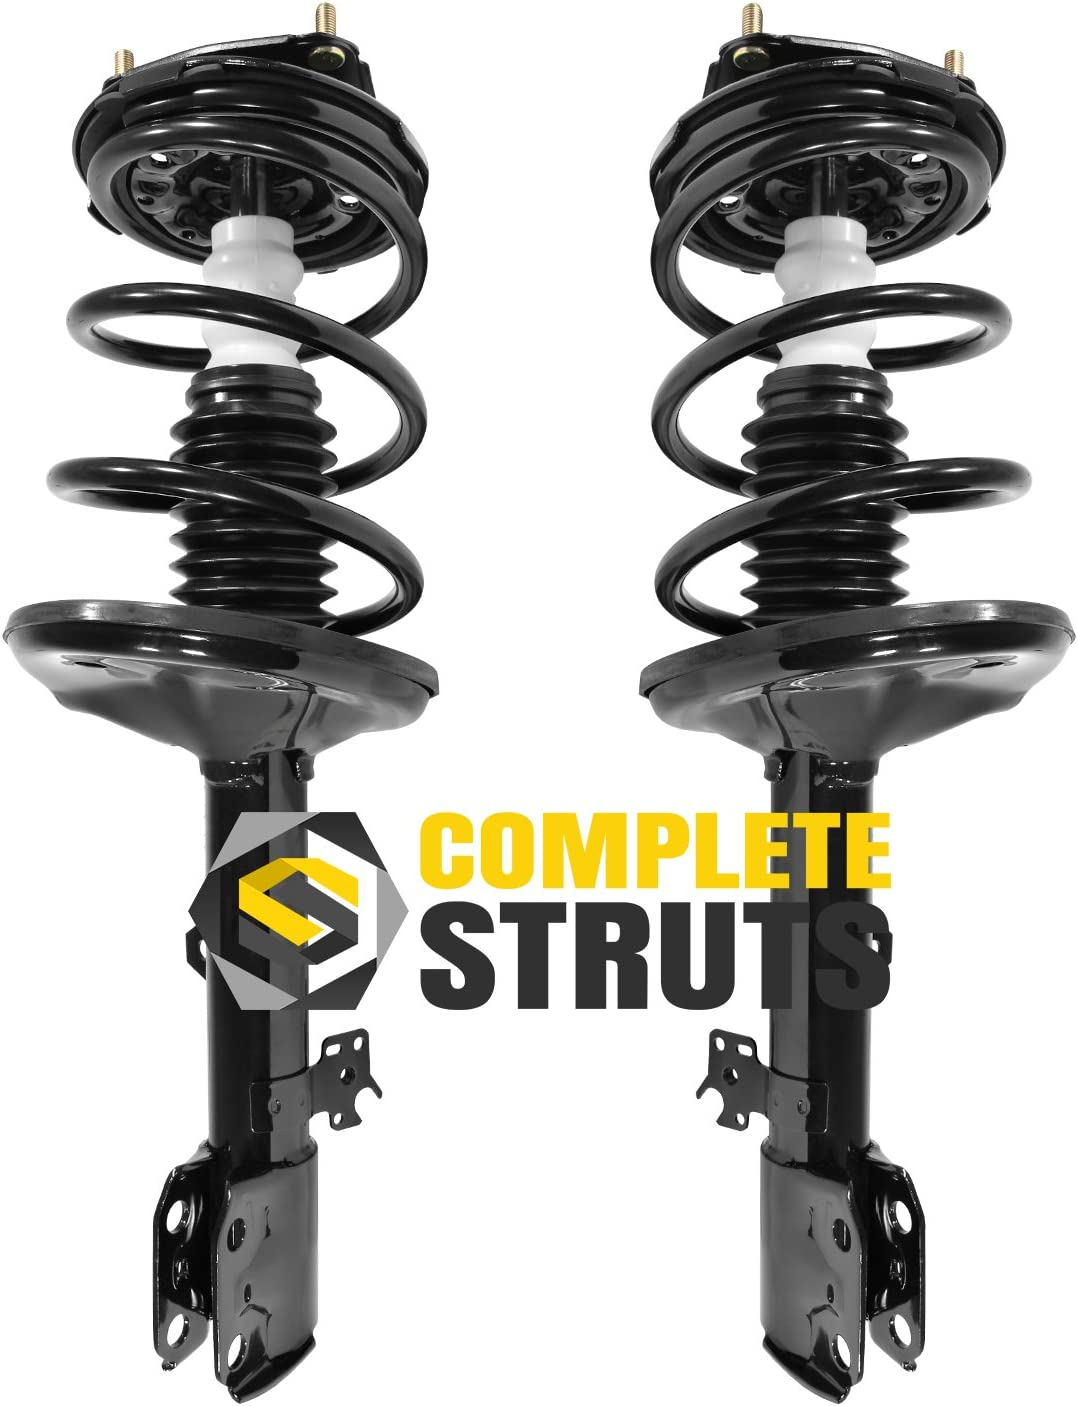 Front Left Quick Complete Strut /& Coil Spring Assembly for 1996-2000 Toyota RAV4